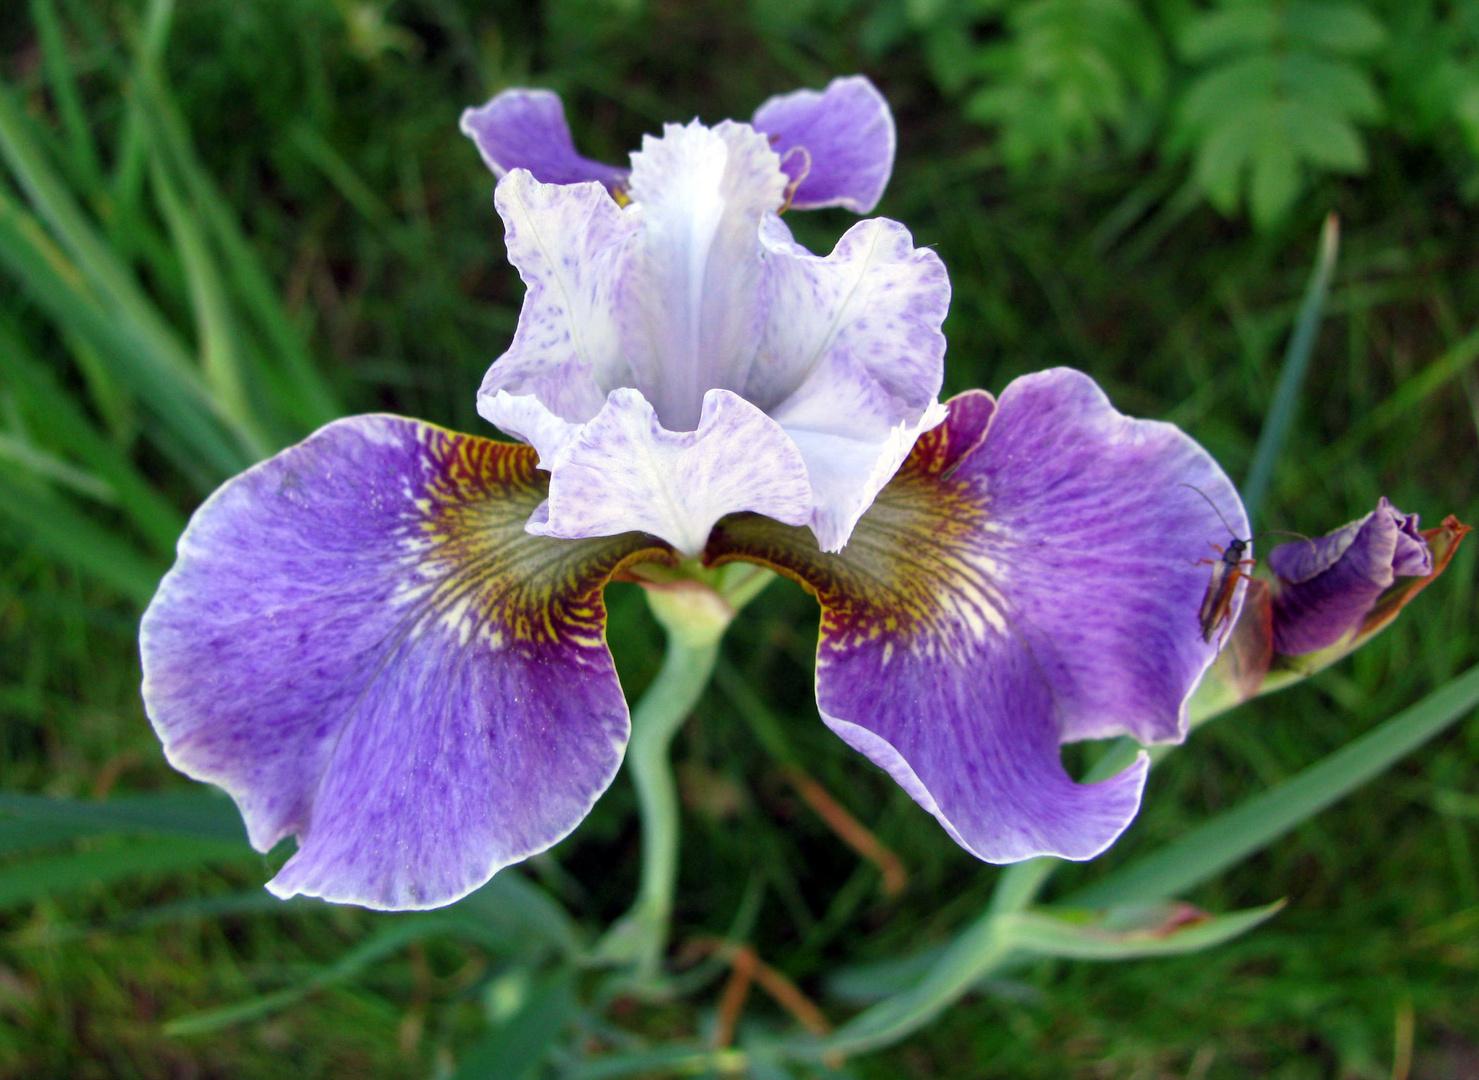 Wie bekommt die Natur diese Farben hin bei dieser blauen Iris